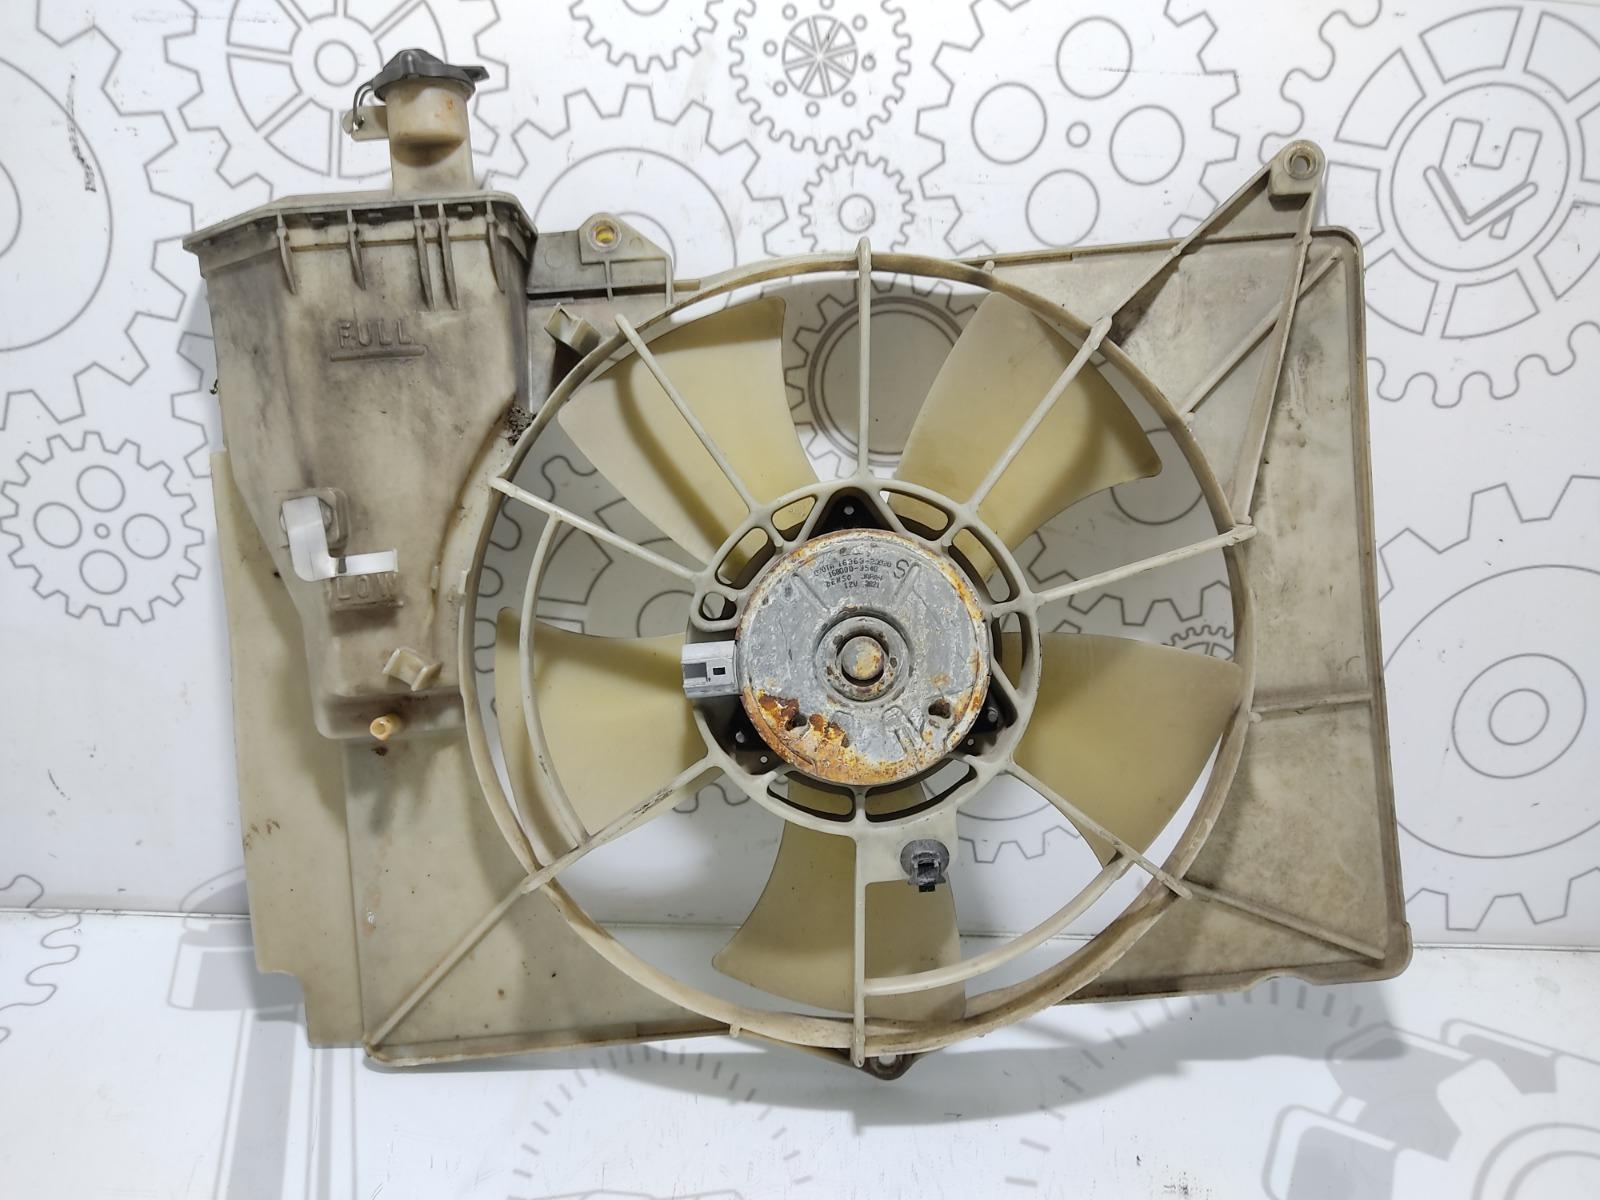 Вентилятор радиатора Toyota Yaris Verso 1.3 I 2000 (б/у)